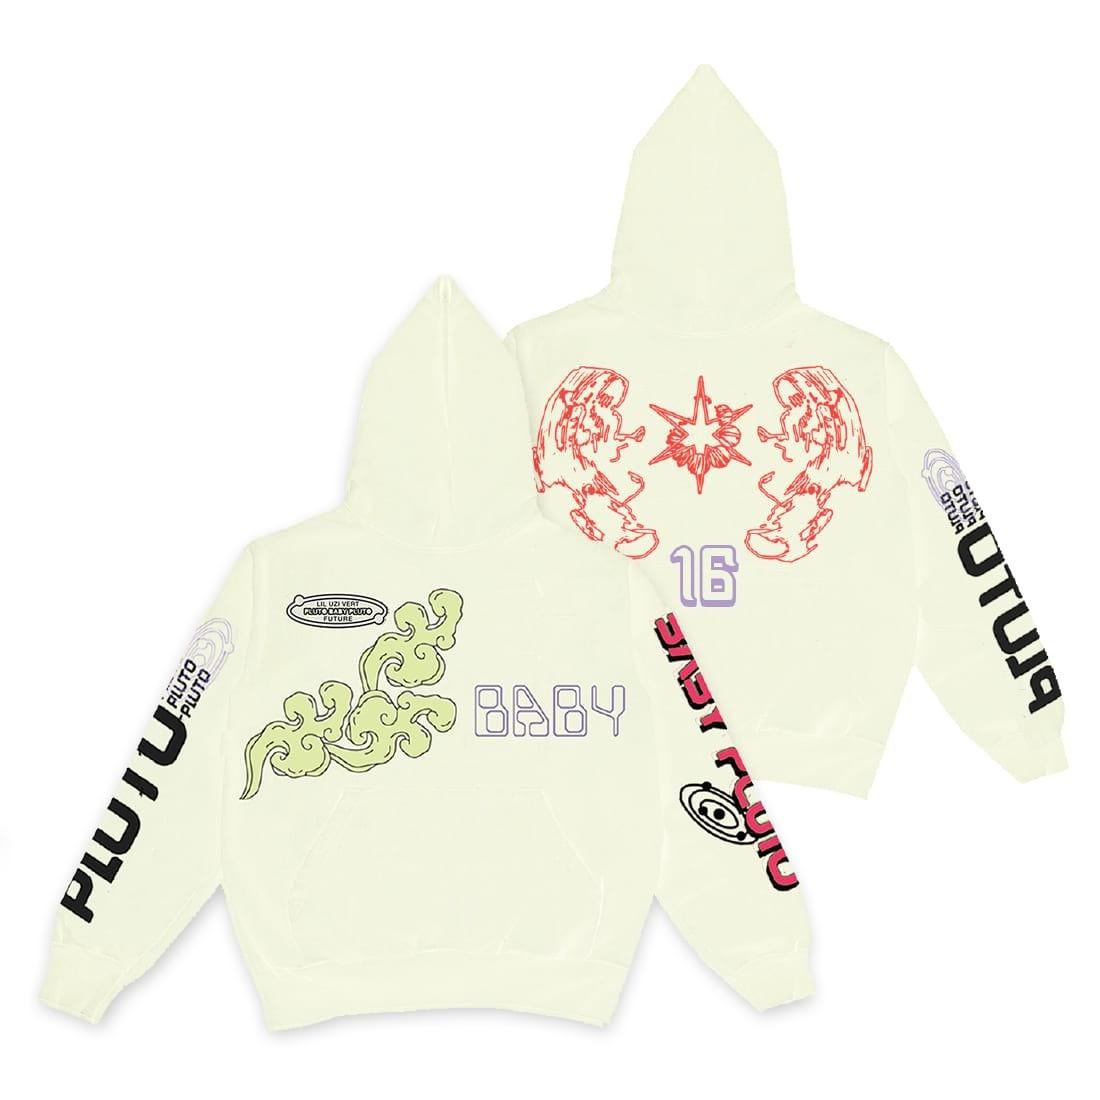 Future Lil Uzi Vert merchandising